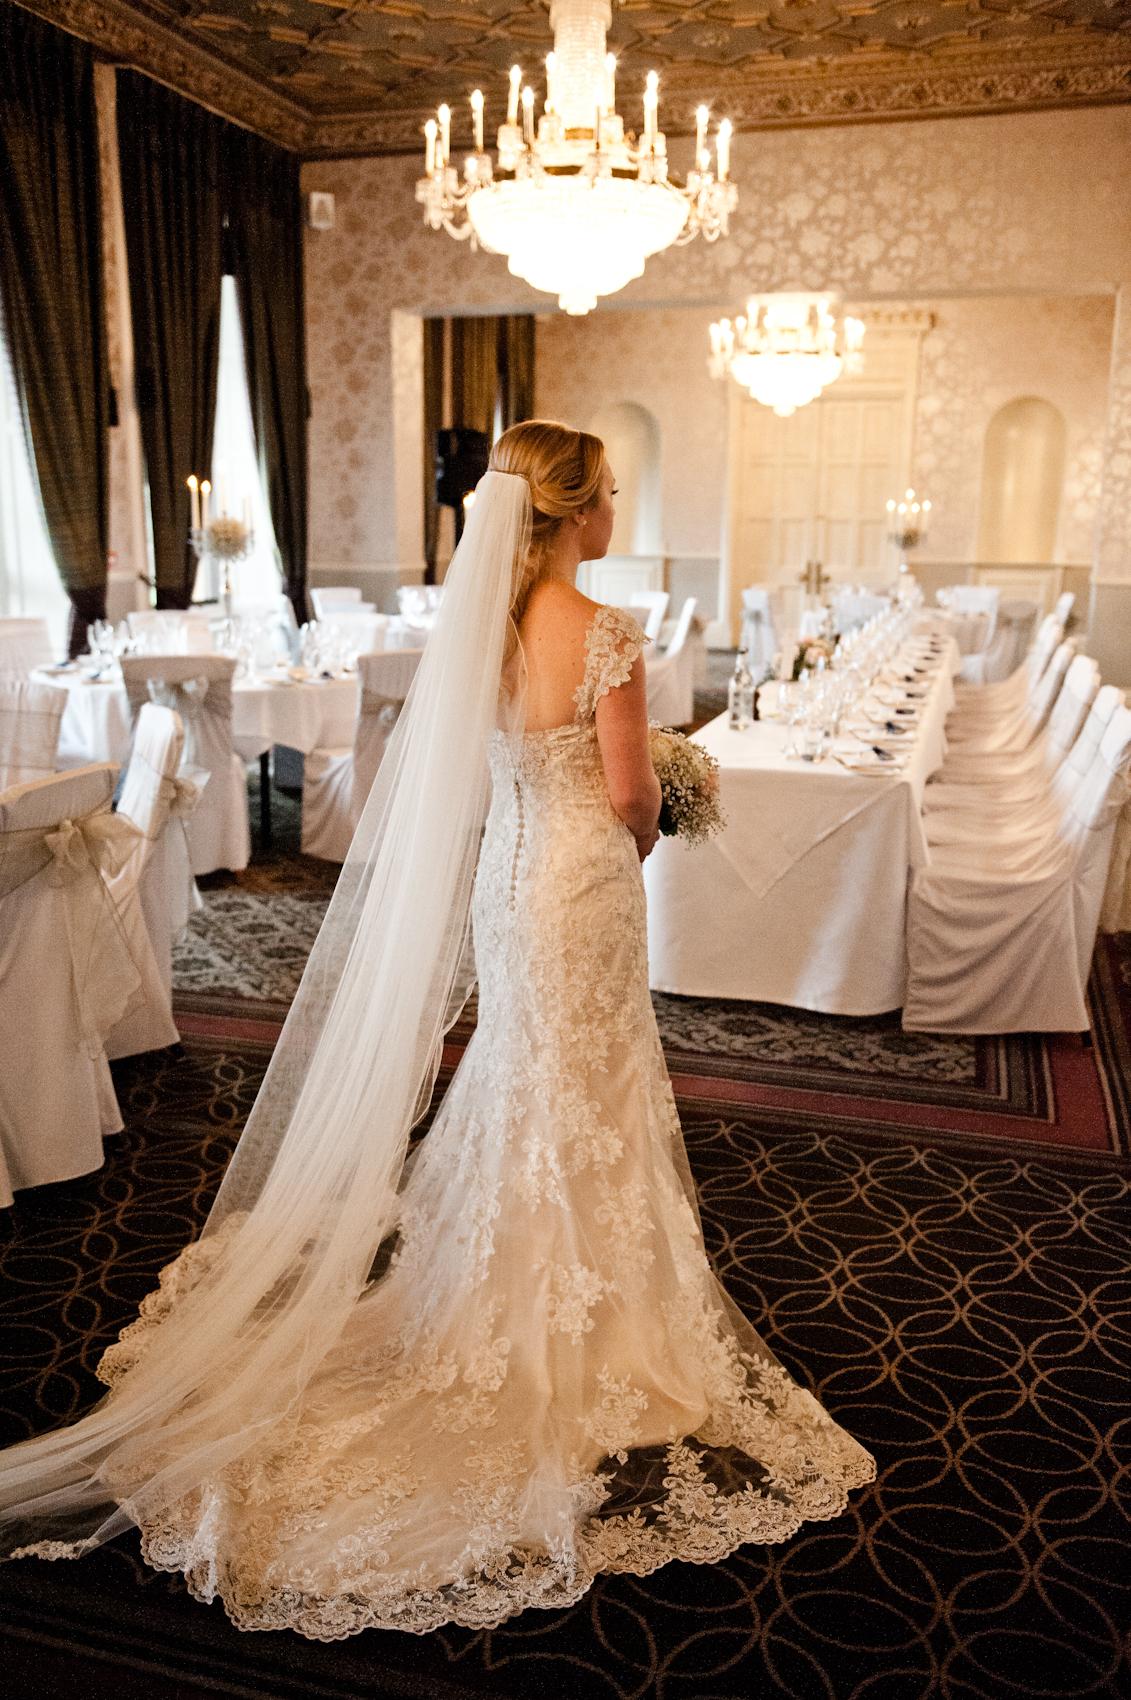 Declan & Emma wedding (16 of 29).jpg